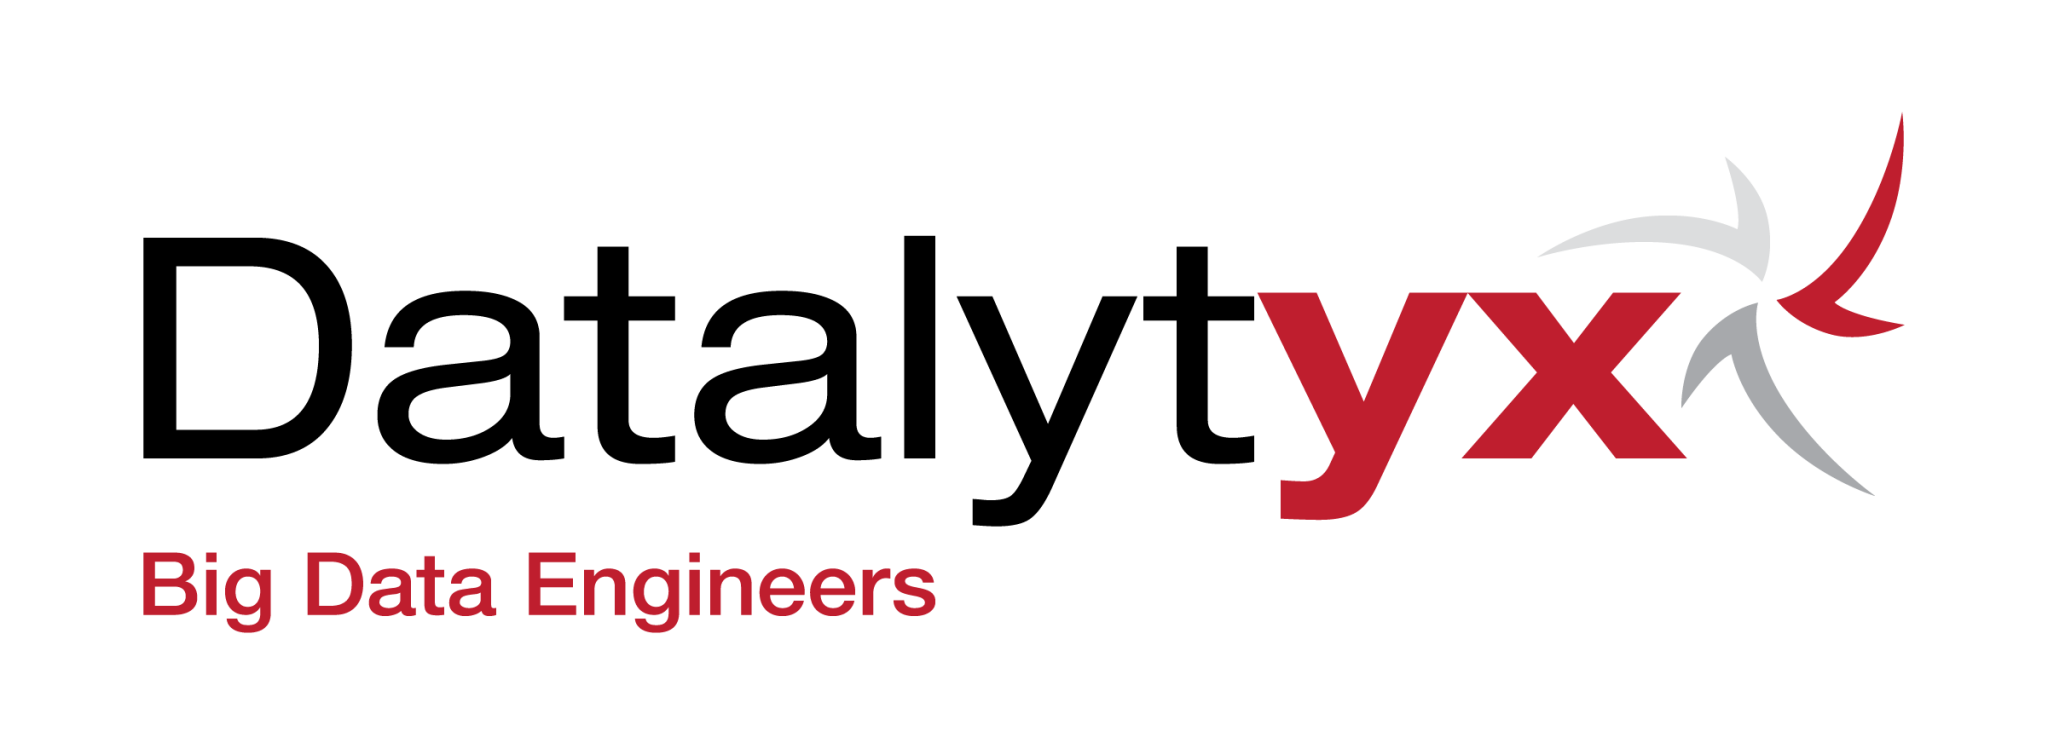 datalytyx logo.png